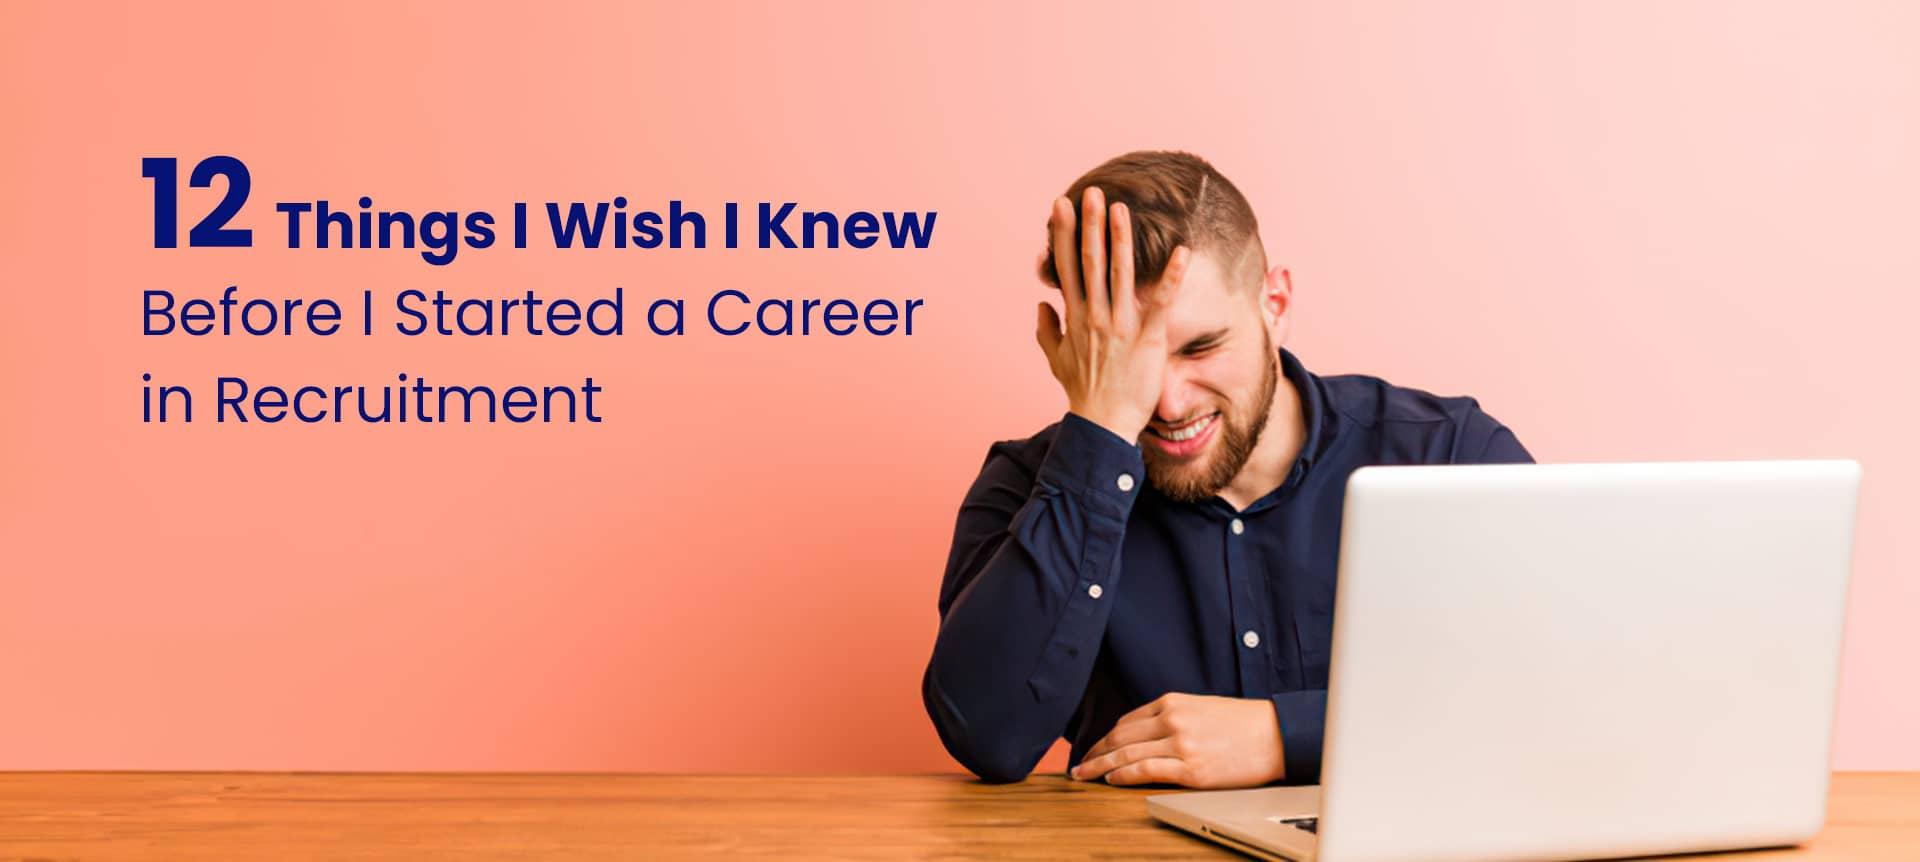 A talent acquisition specialist